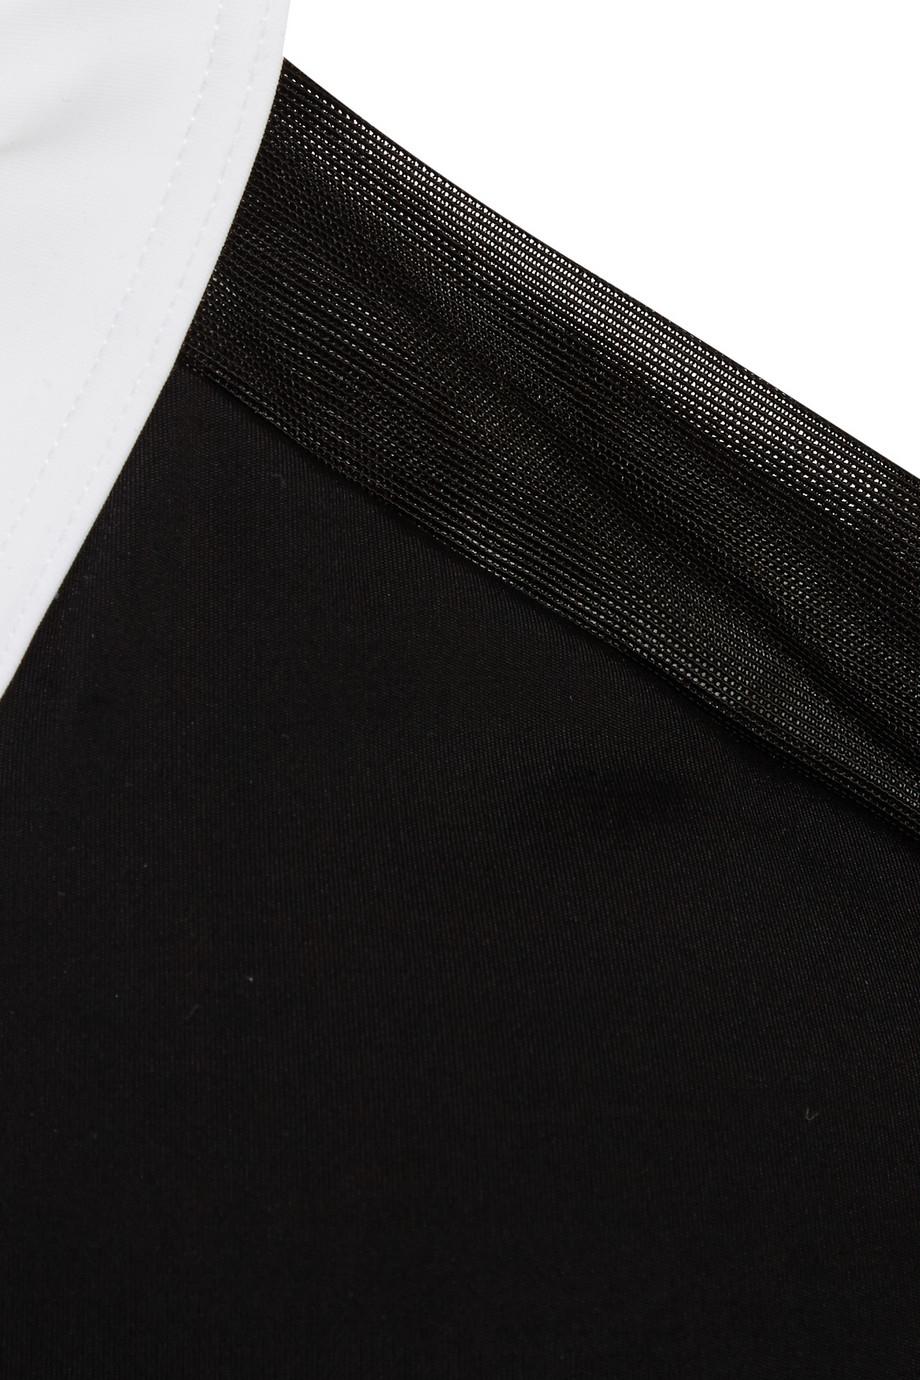 ee8b2eabfb Lyst - Calvin Klein Flex Motion Convertible Mesh-trimmed Stretch ...